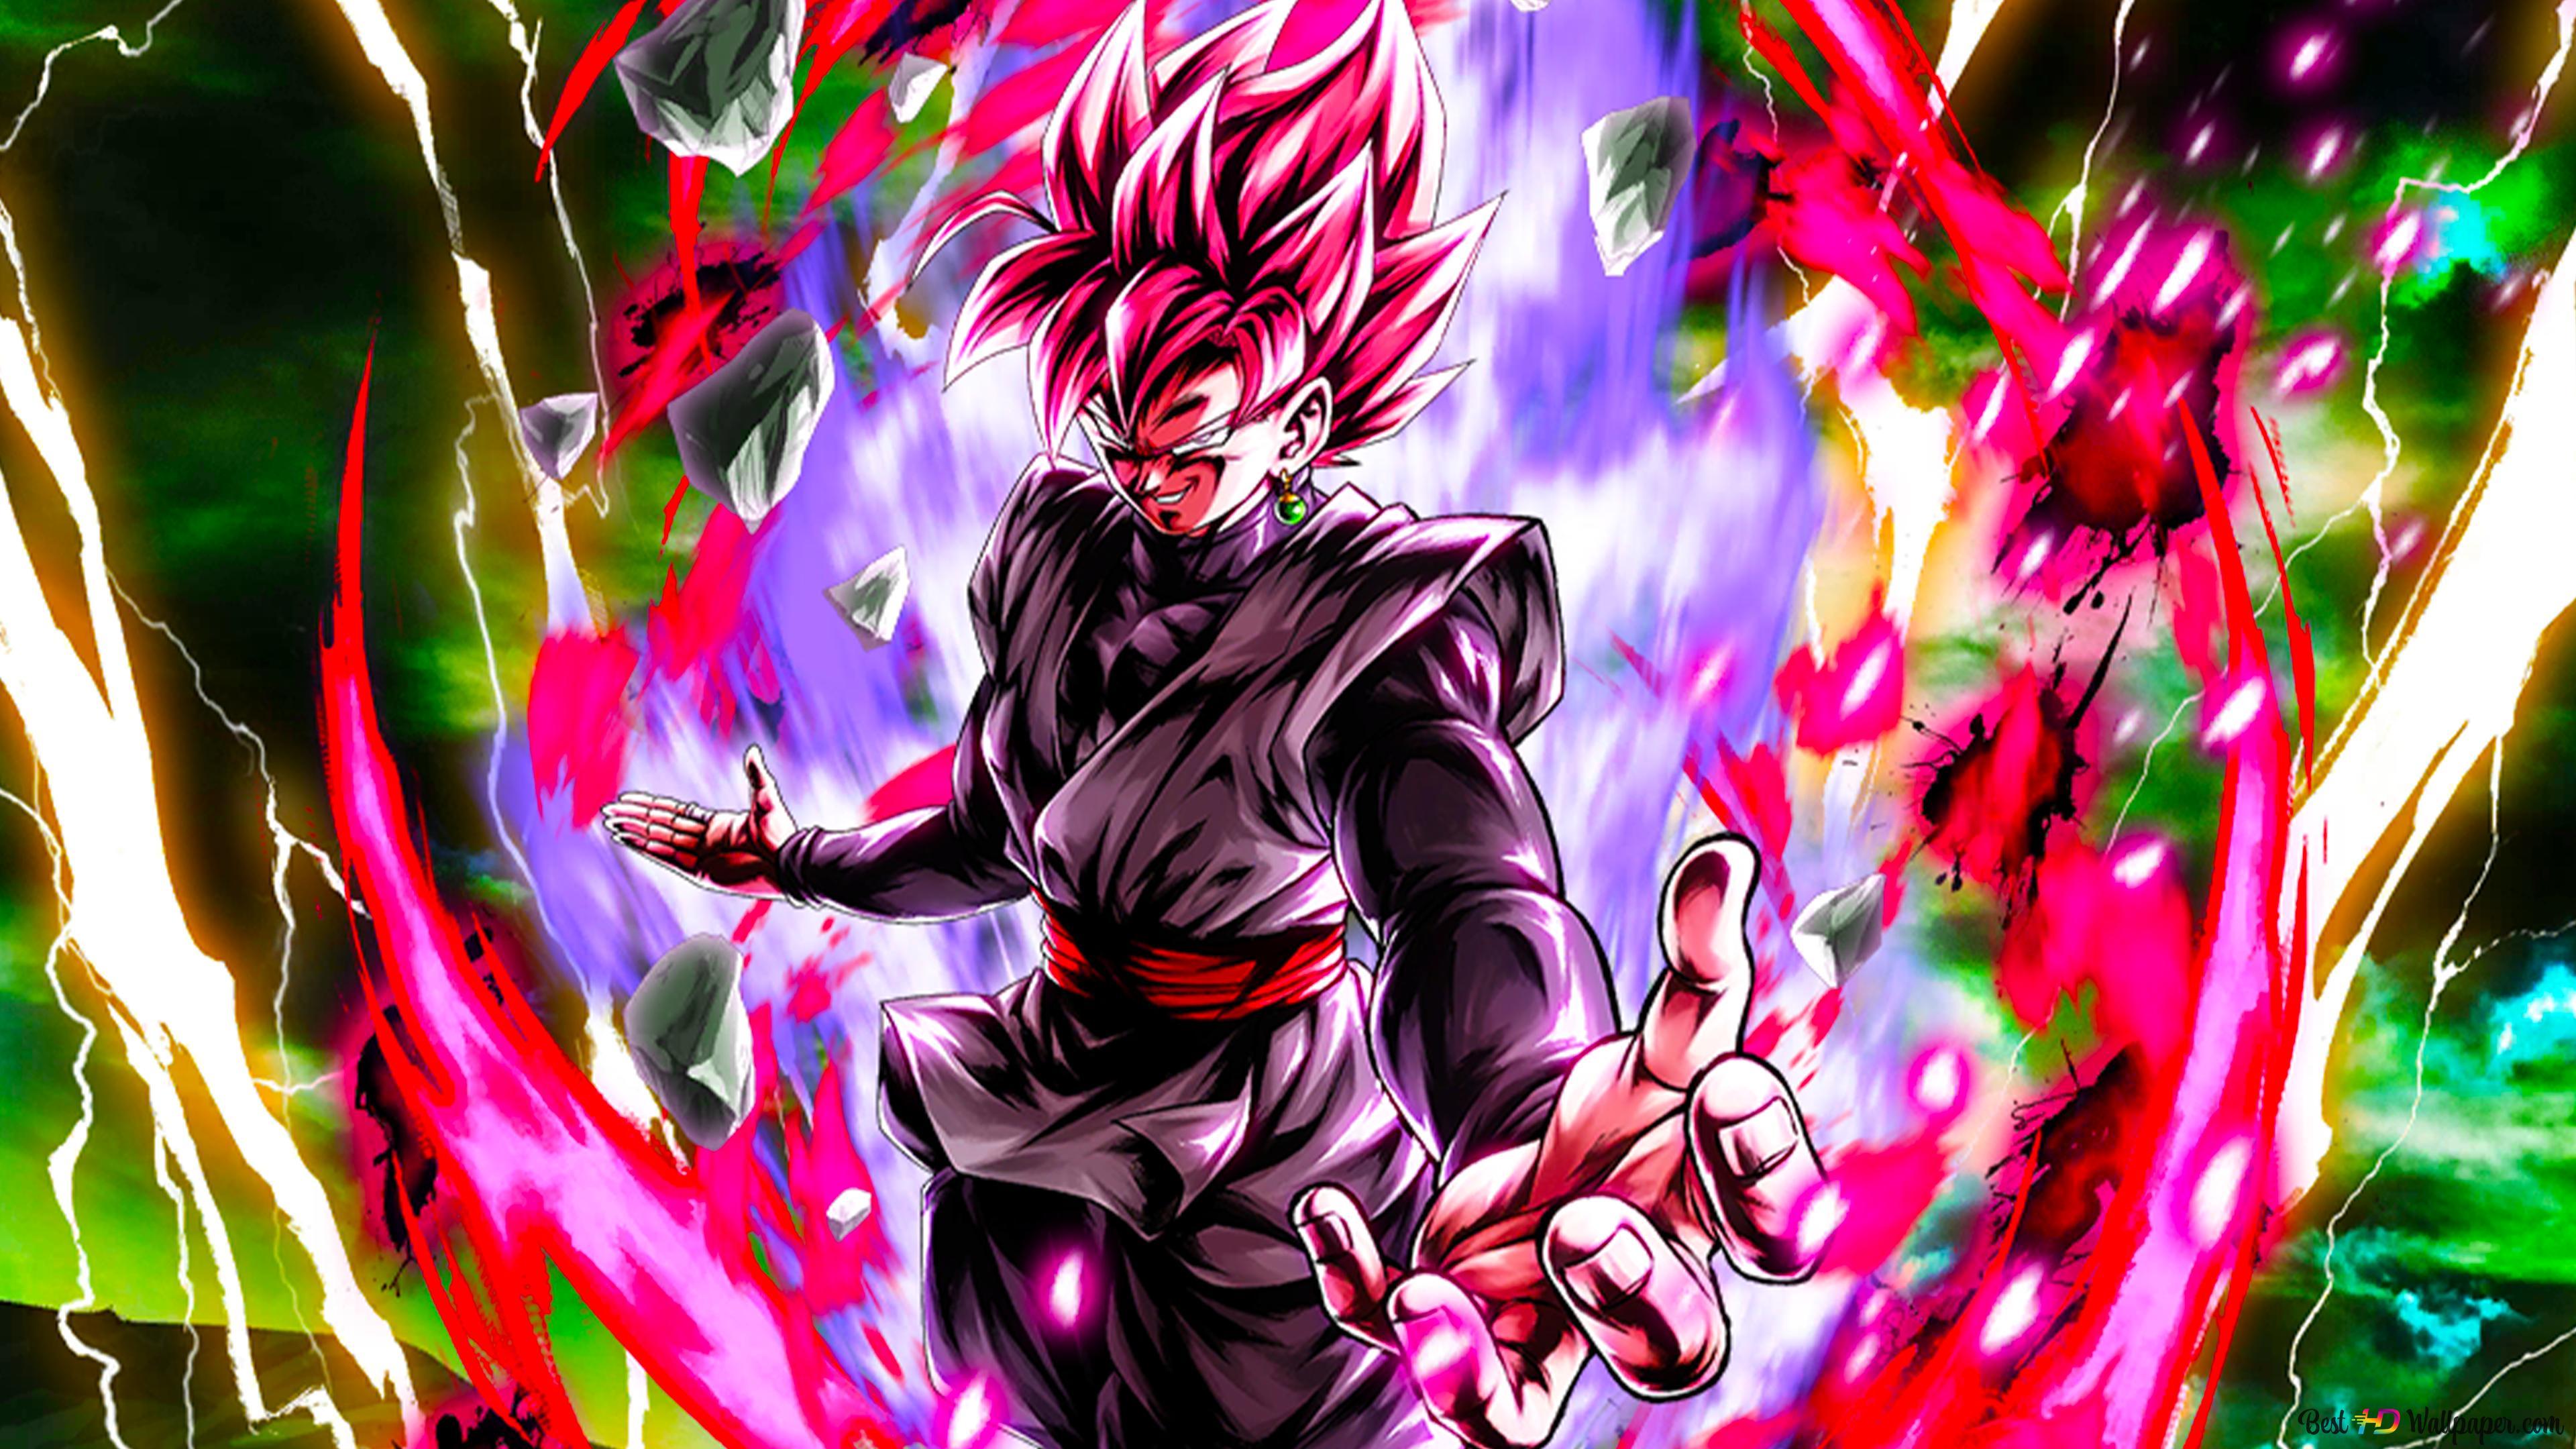 Super Saiyan Rose Goku Black From Dragon Ball Super Dragon Ball Legends Arts For Desktop Hd Wallpaper Download